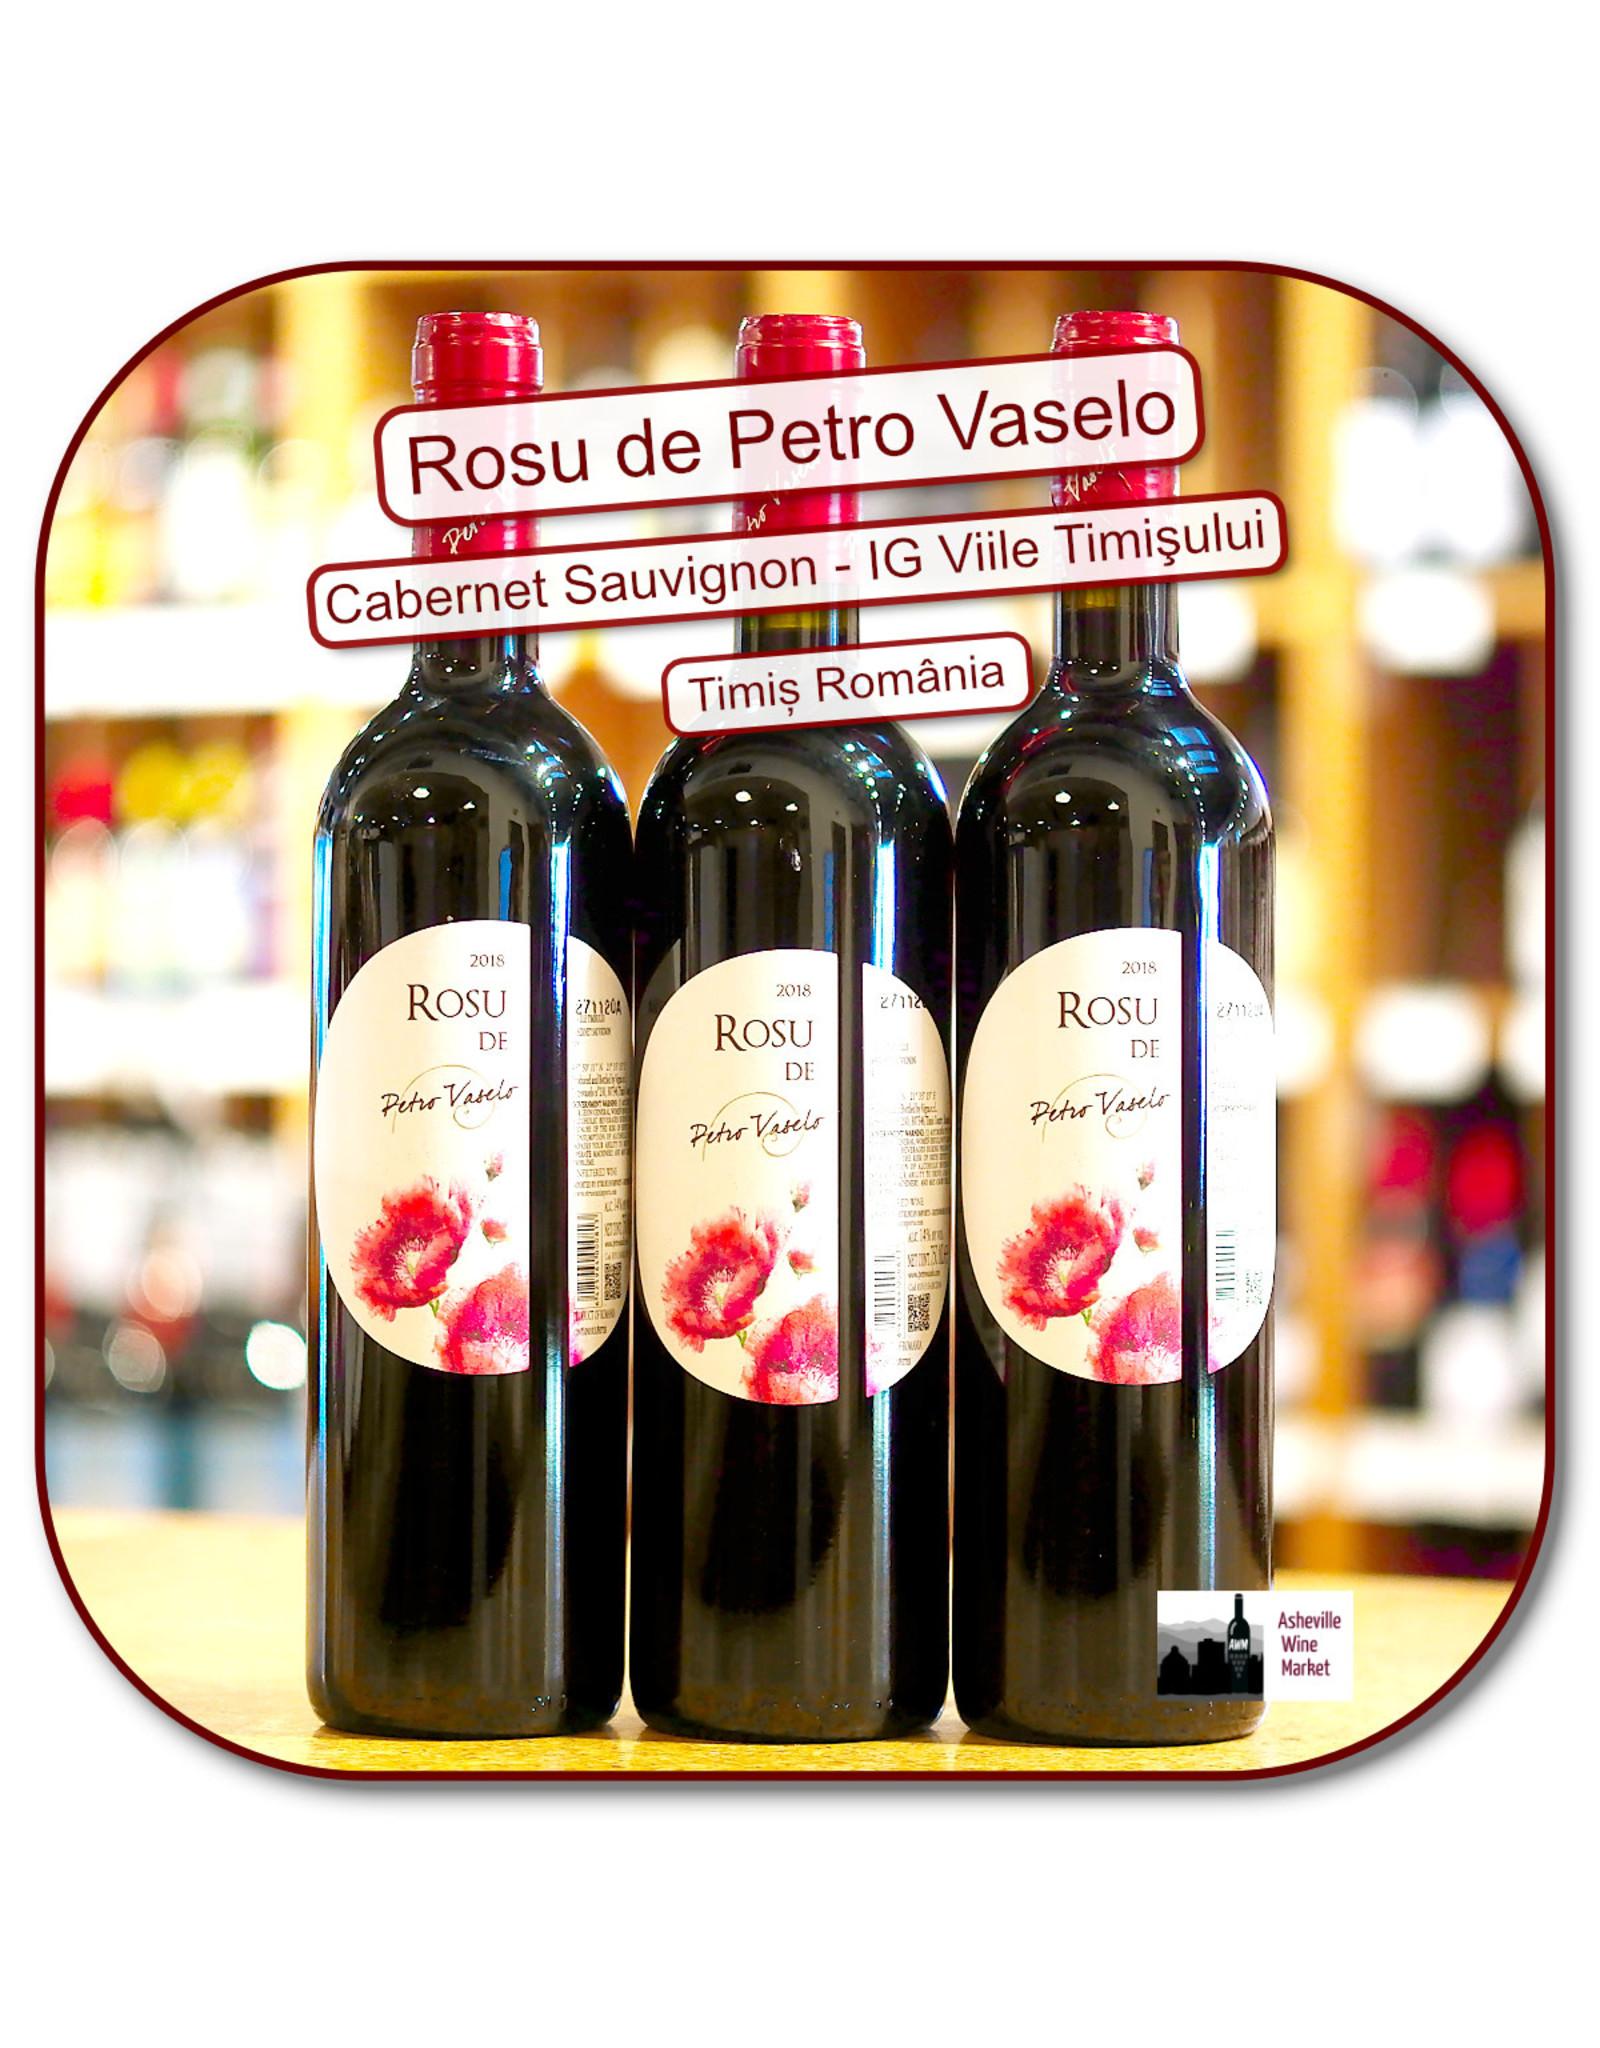 Cabernet Sauvignon Petro Vaselo Rosu Cabernet Sauvignon 19